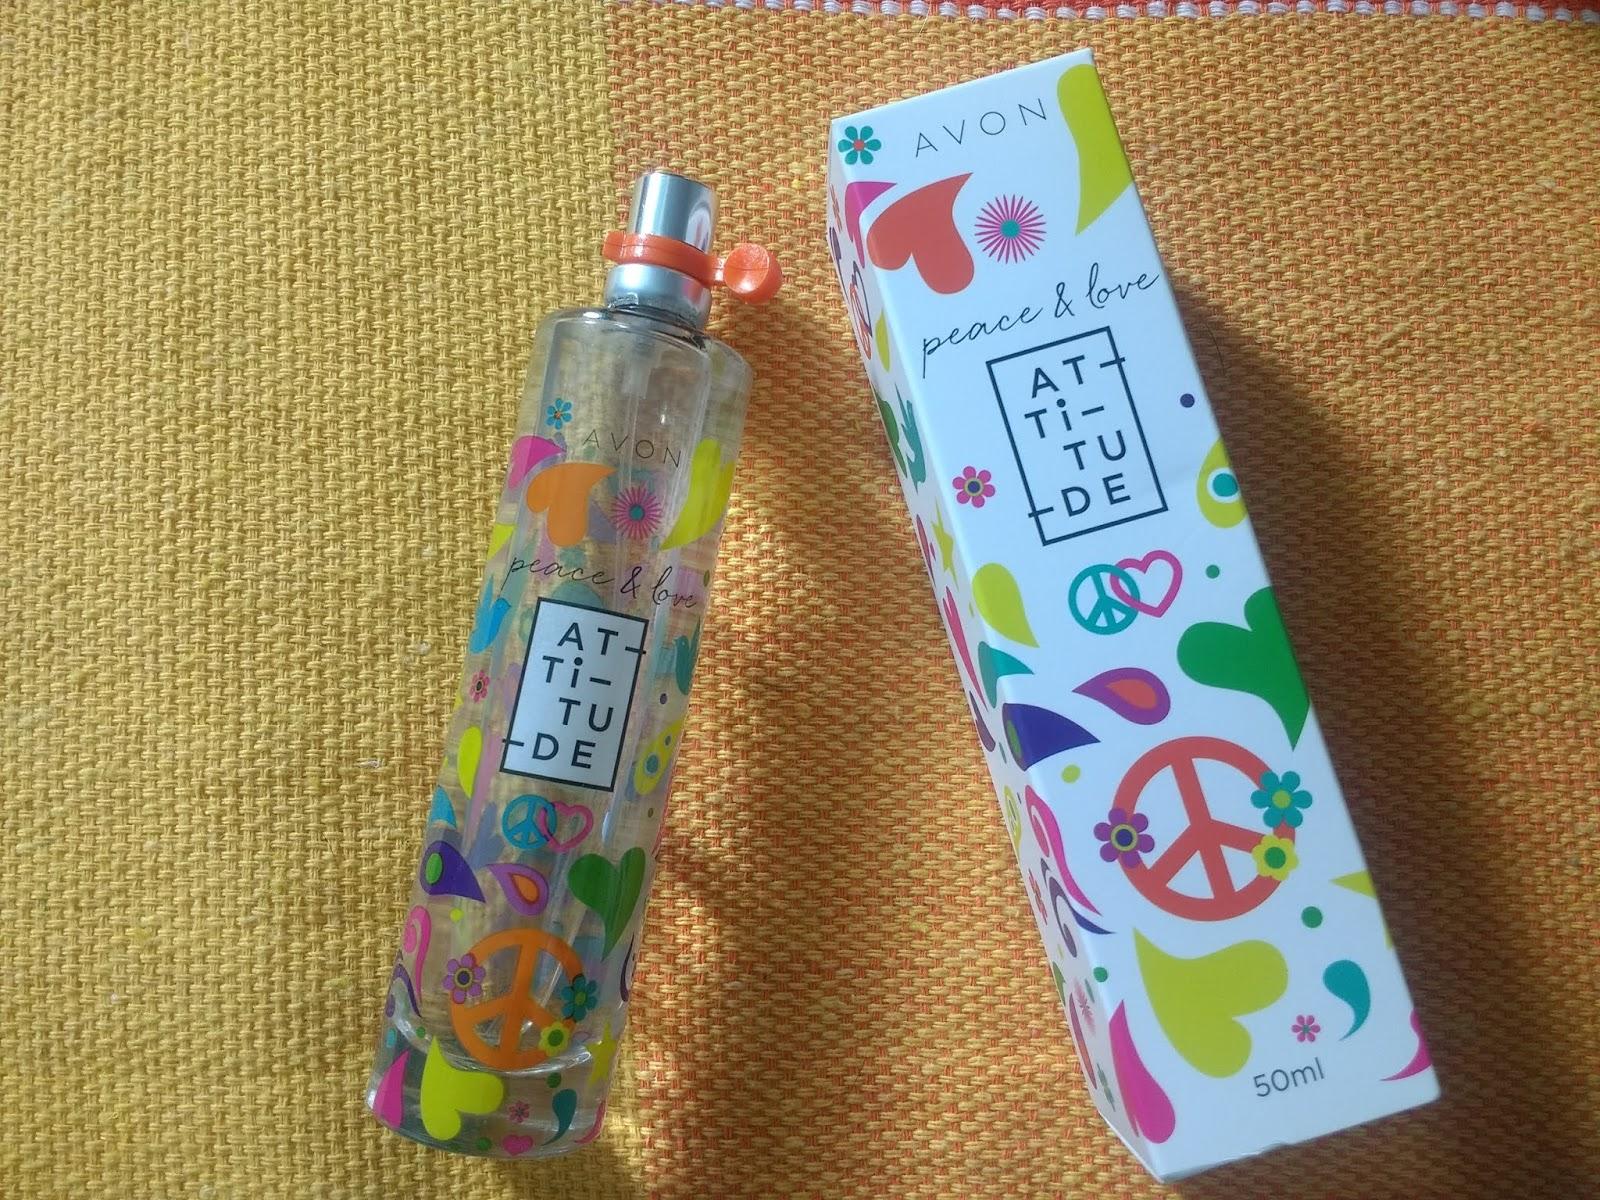 Alquimia Dos Perfumes Peace Love Attitude Avon